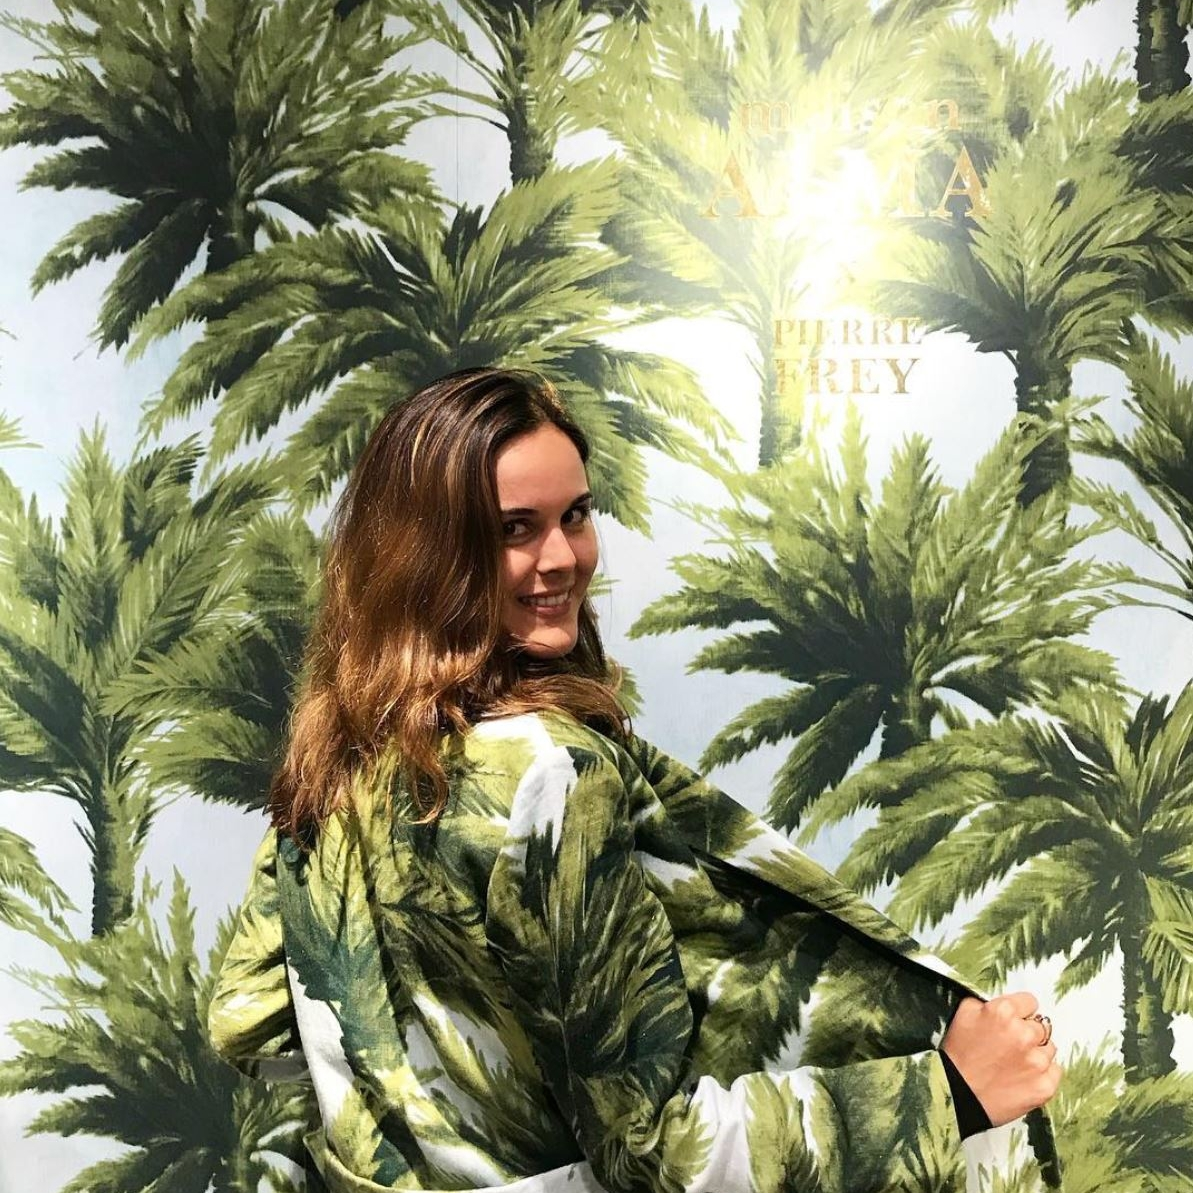 GIOVANNA CAMPAGNA - La Palma Kimono Coat  #consulgint #luxuryfashion #creoconsulting #girlboss #almagirl  @ Bergdorf Goodman in NYC